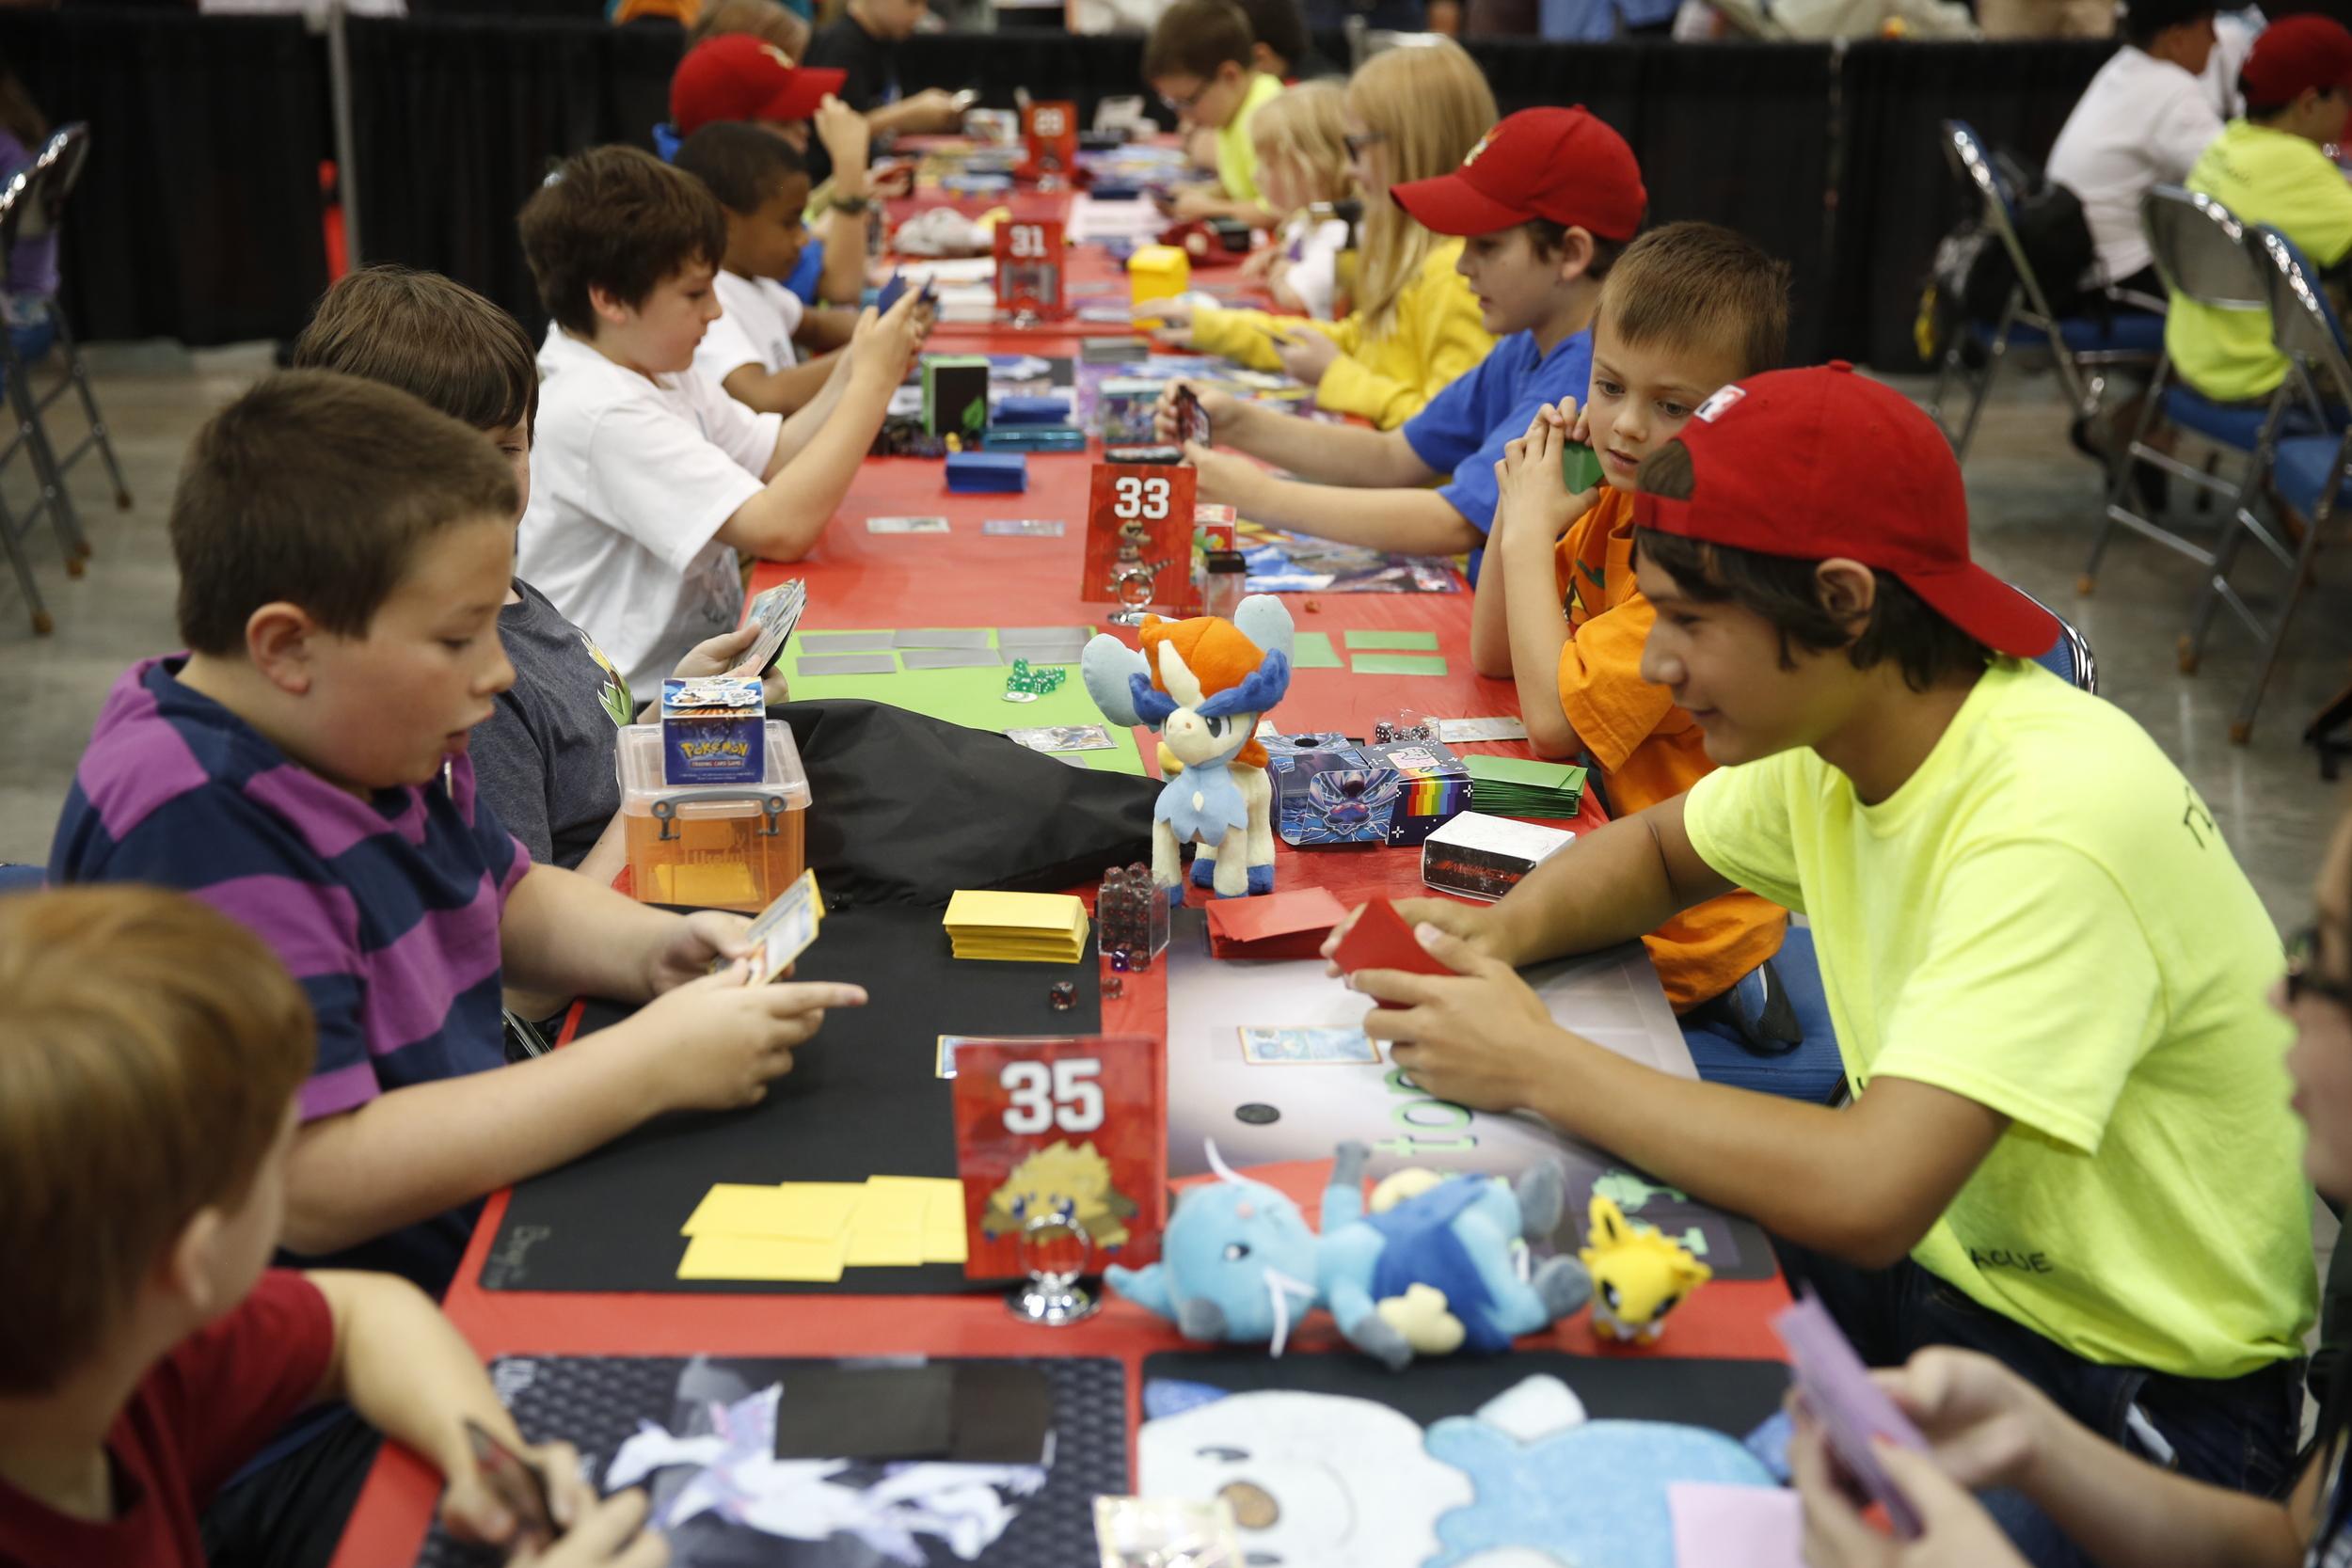 2013 U.S. Pokémon National Championships Image 2.JPG